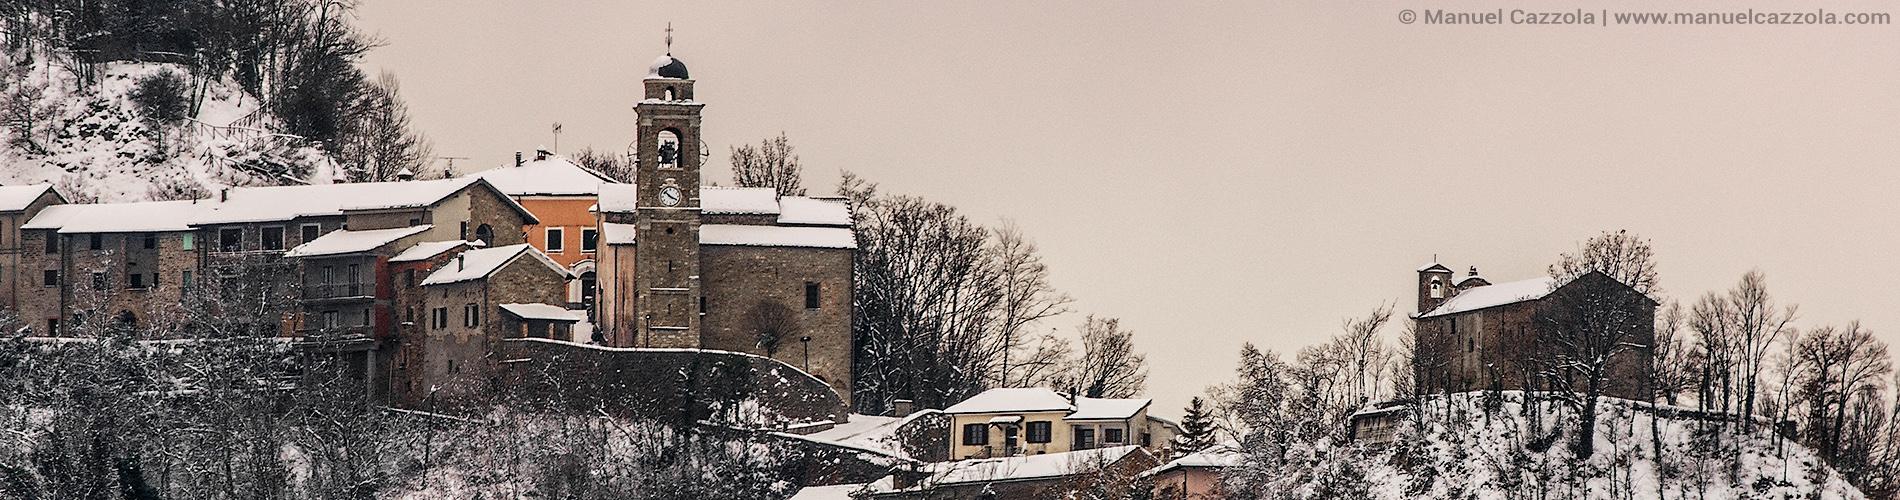 Montechiarodacqui04_Foto_Manuel_Cazzola